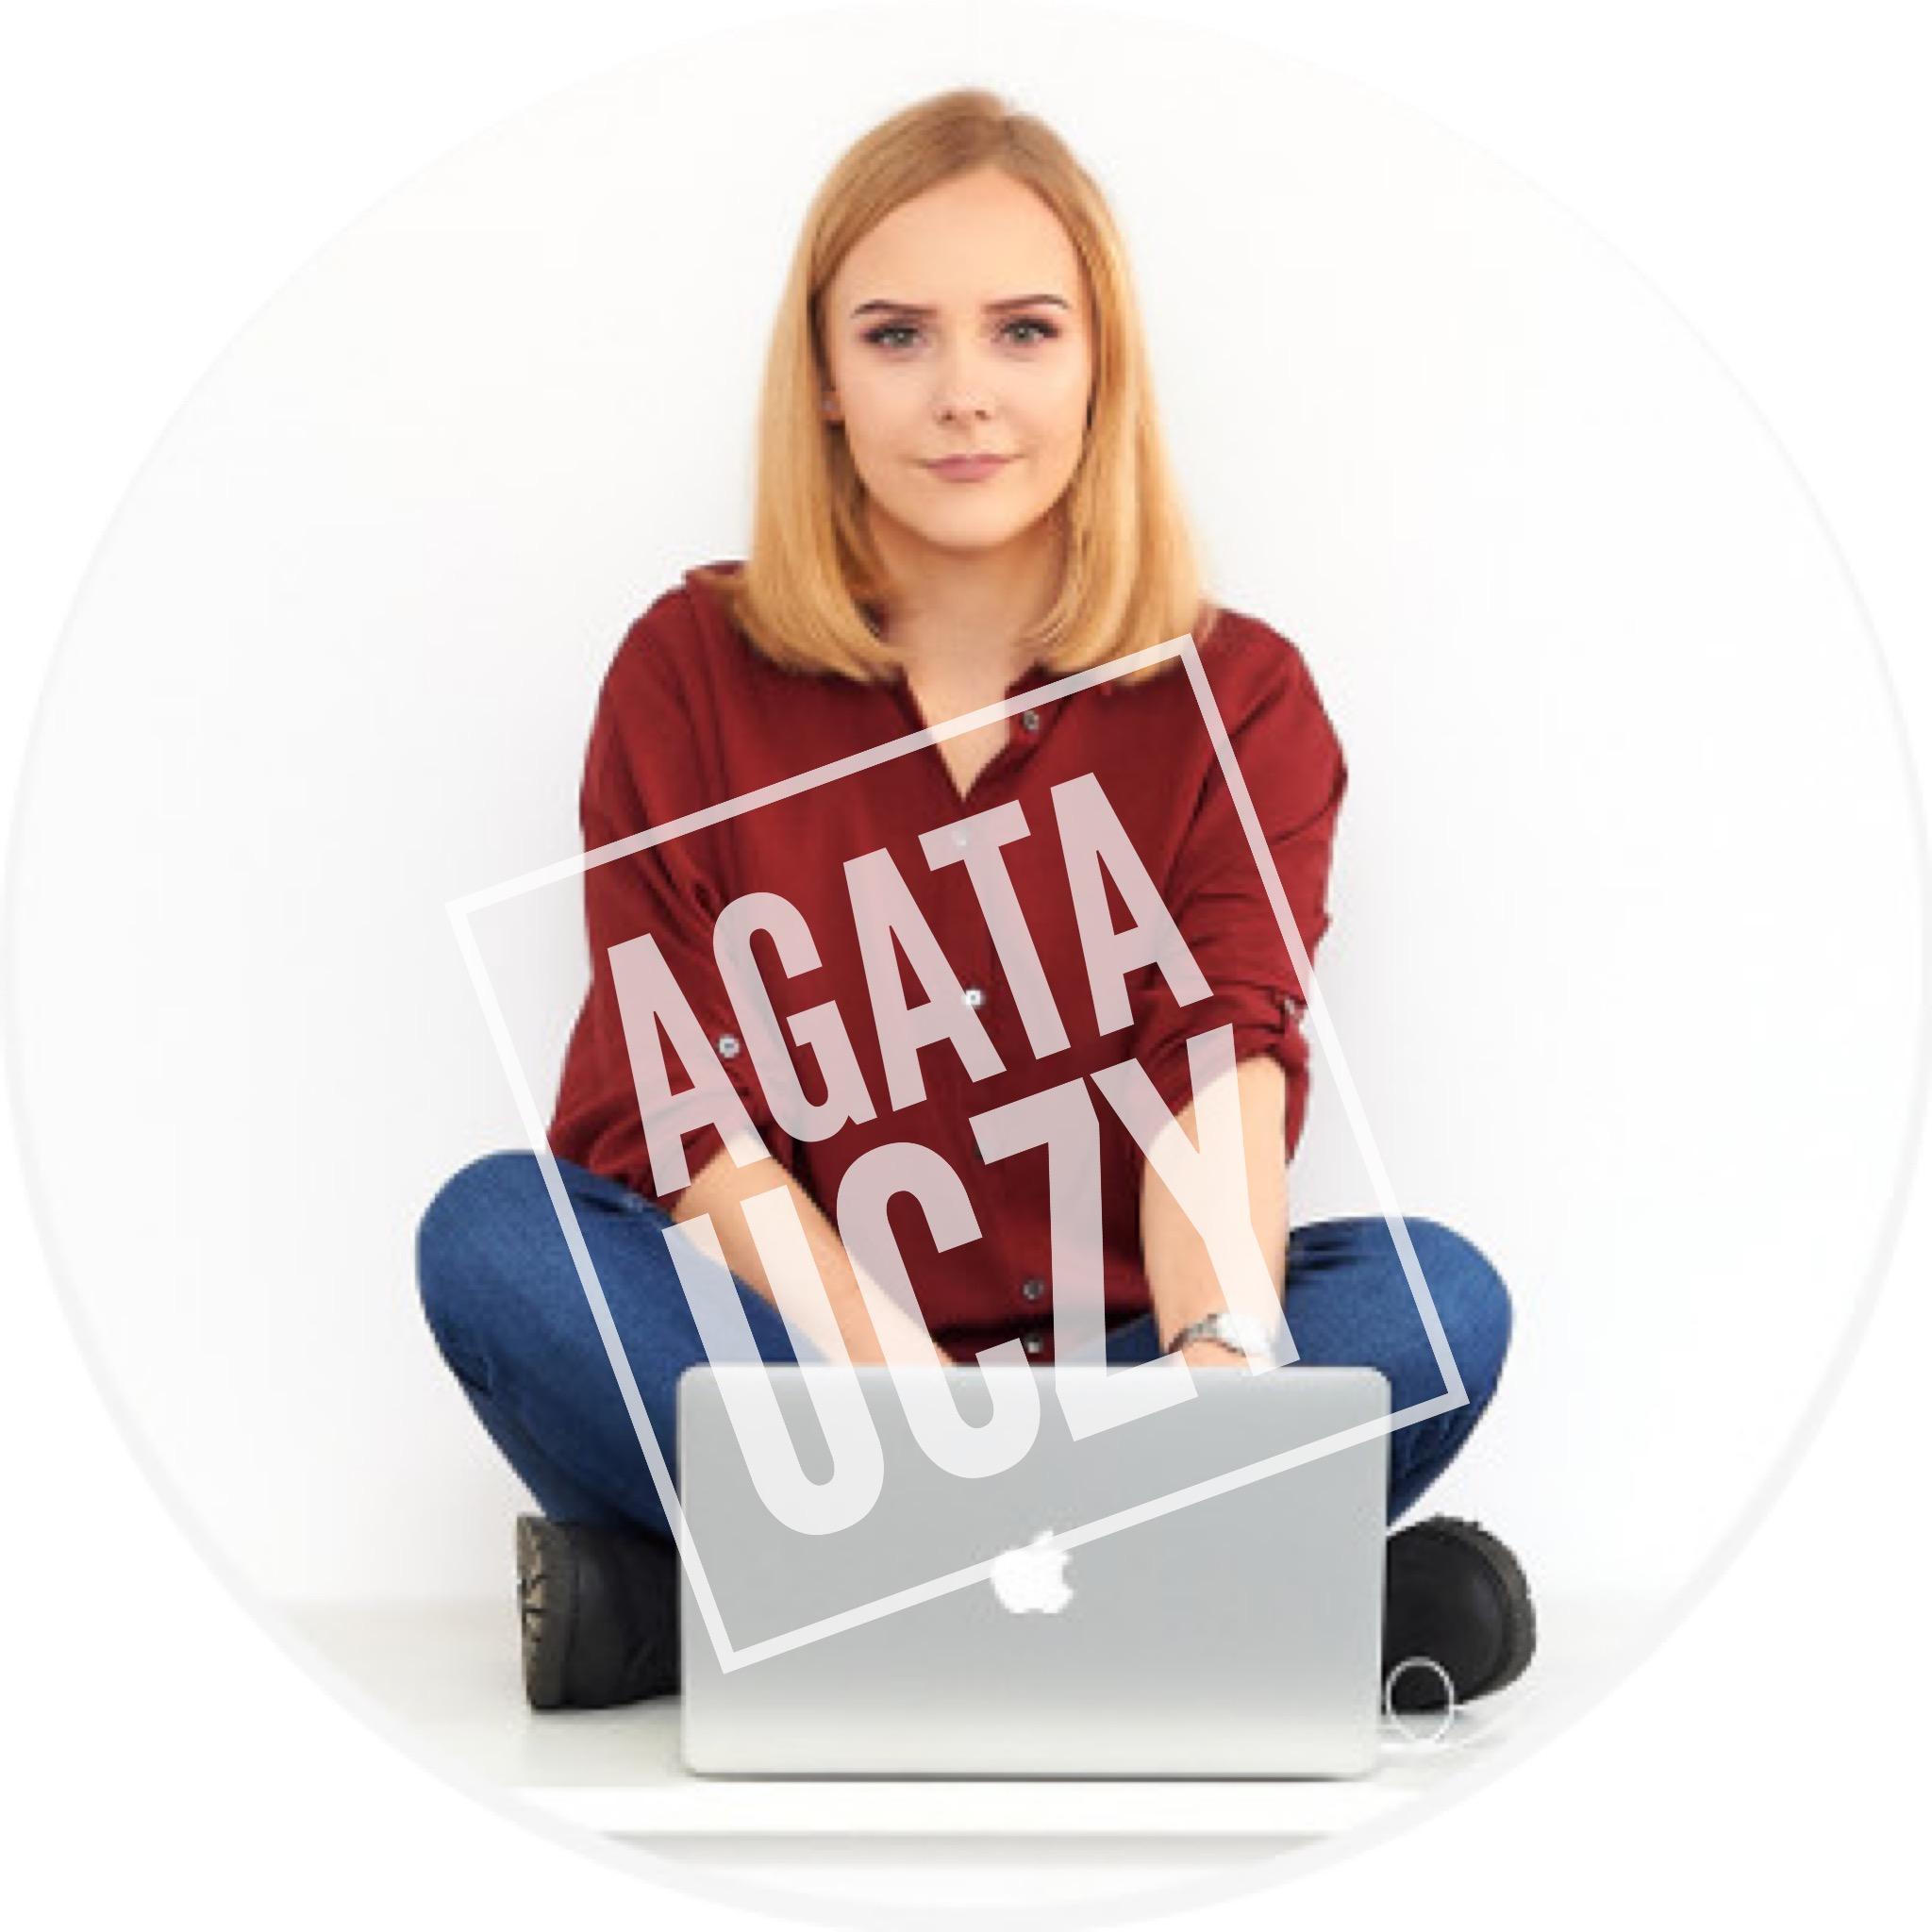 Agata UCZY